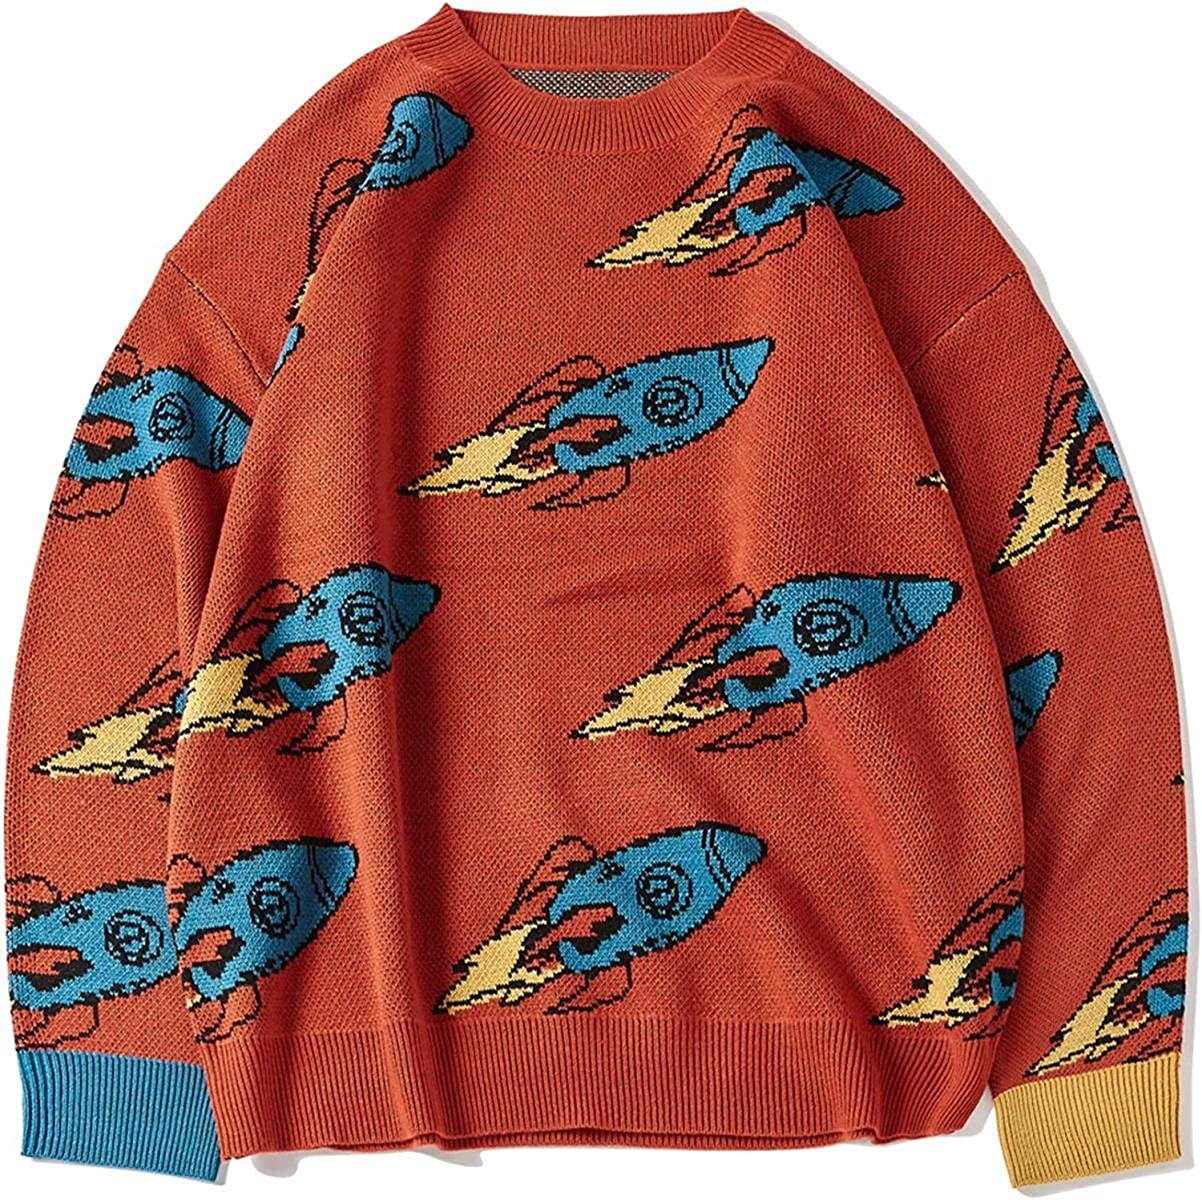 Oversize Sweaters Men Winter High Shipping included San Antonio Mall Pullov Mens Streetwear Fashion